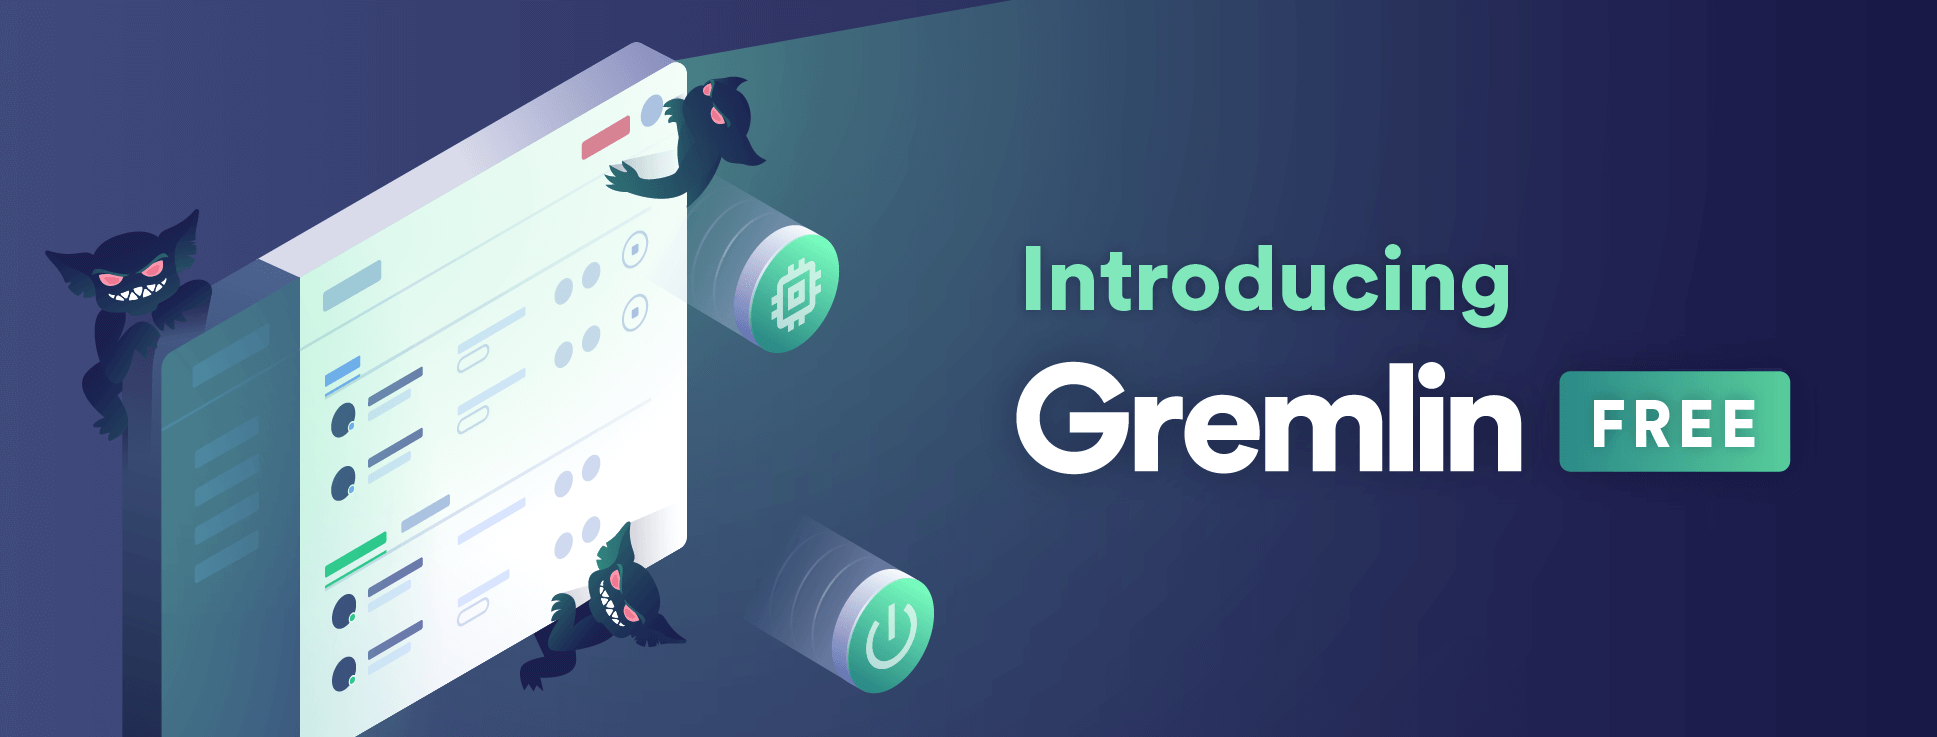 Introducing Gremlin Free